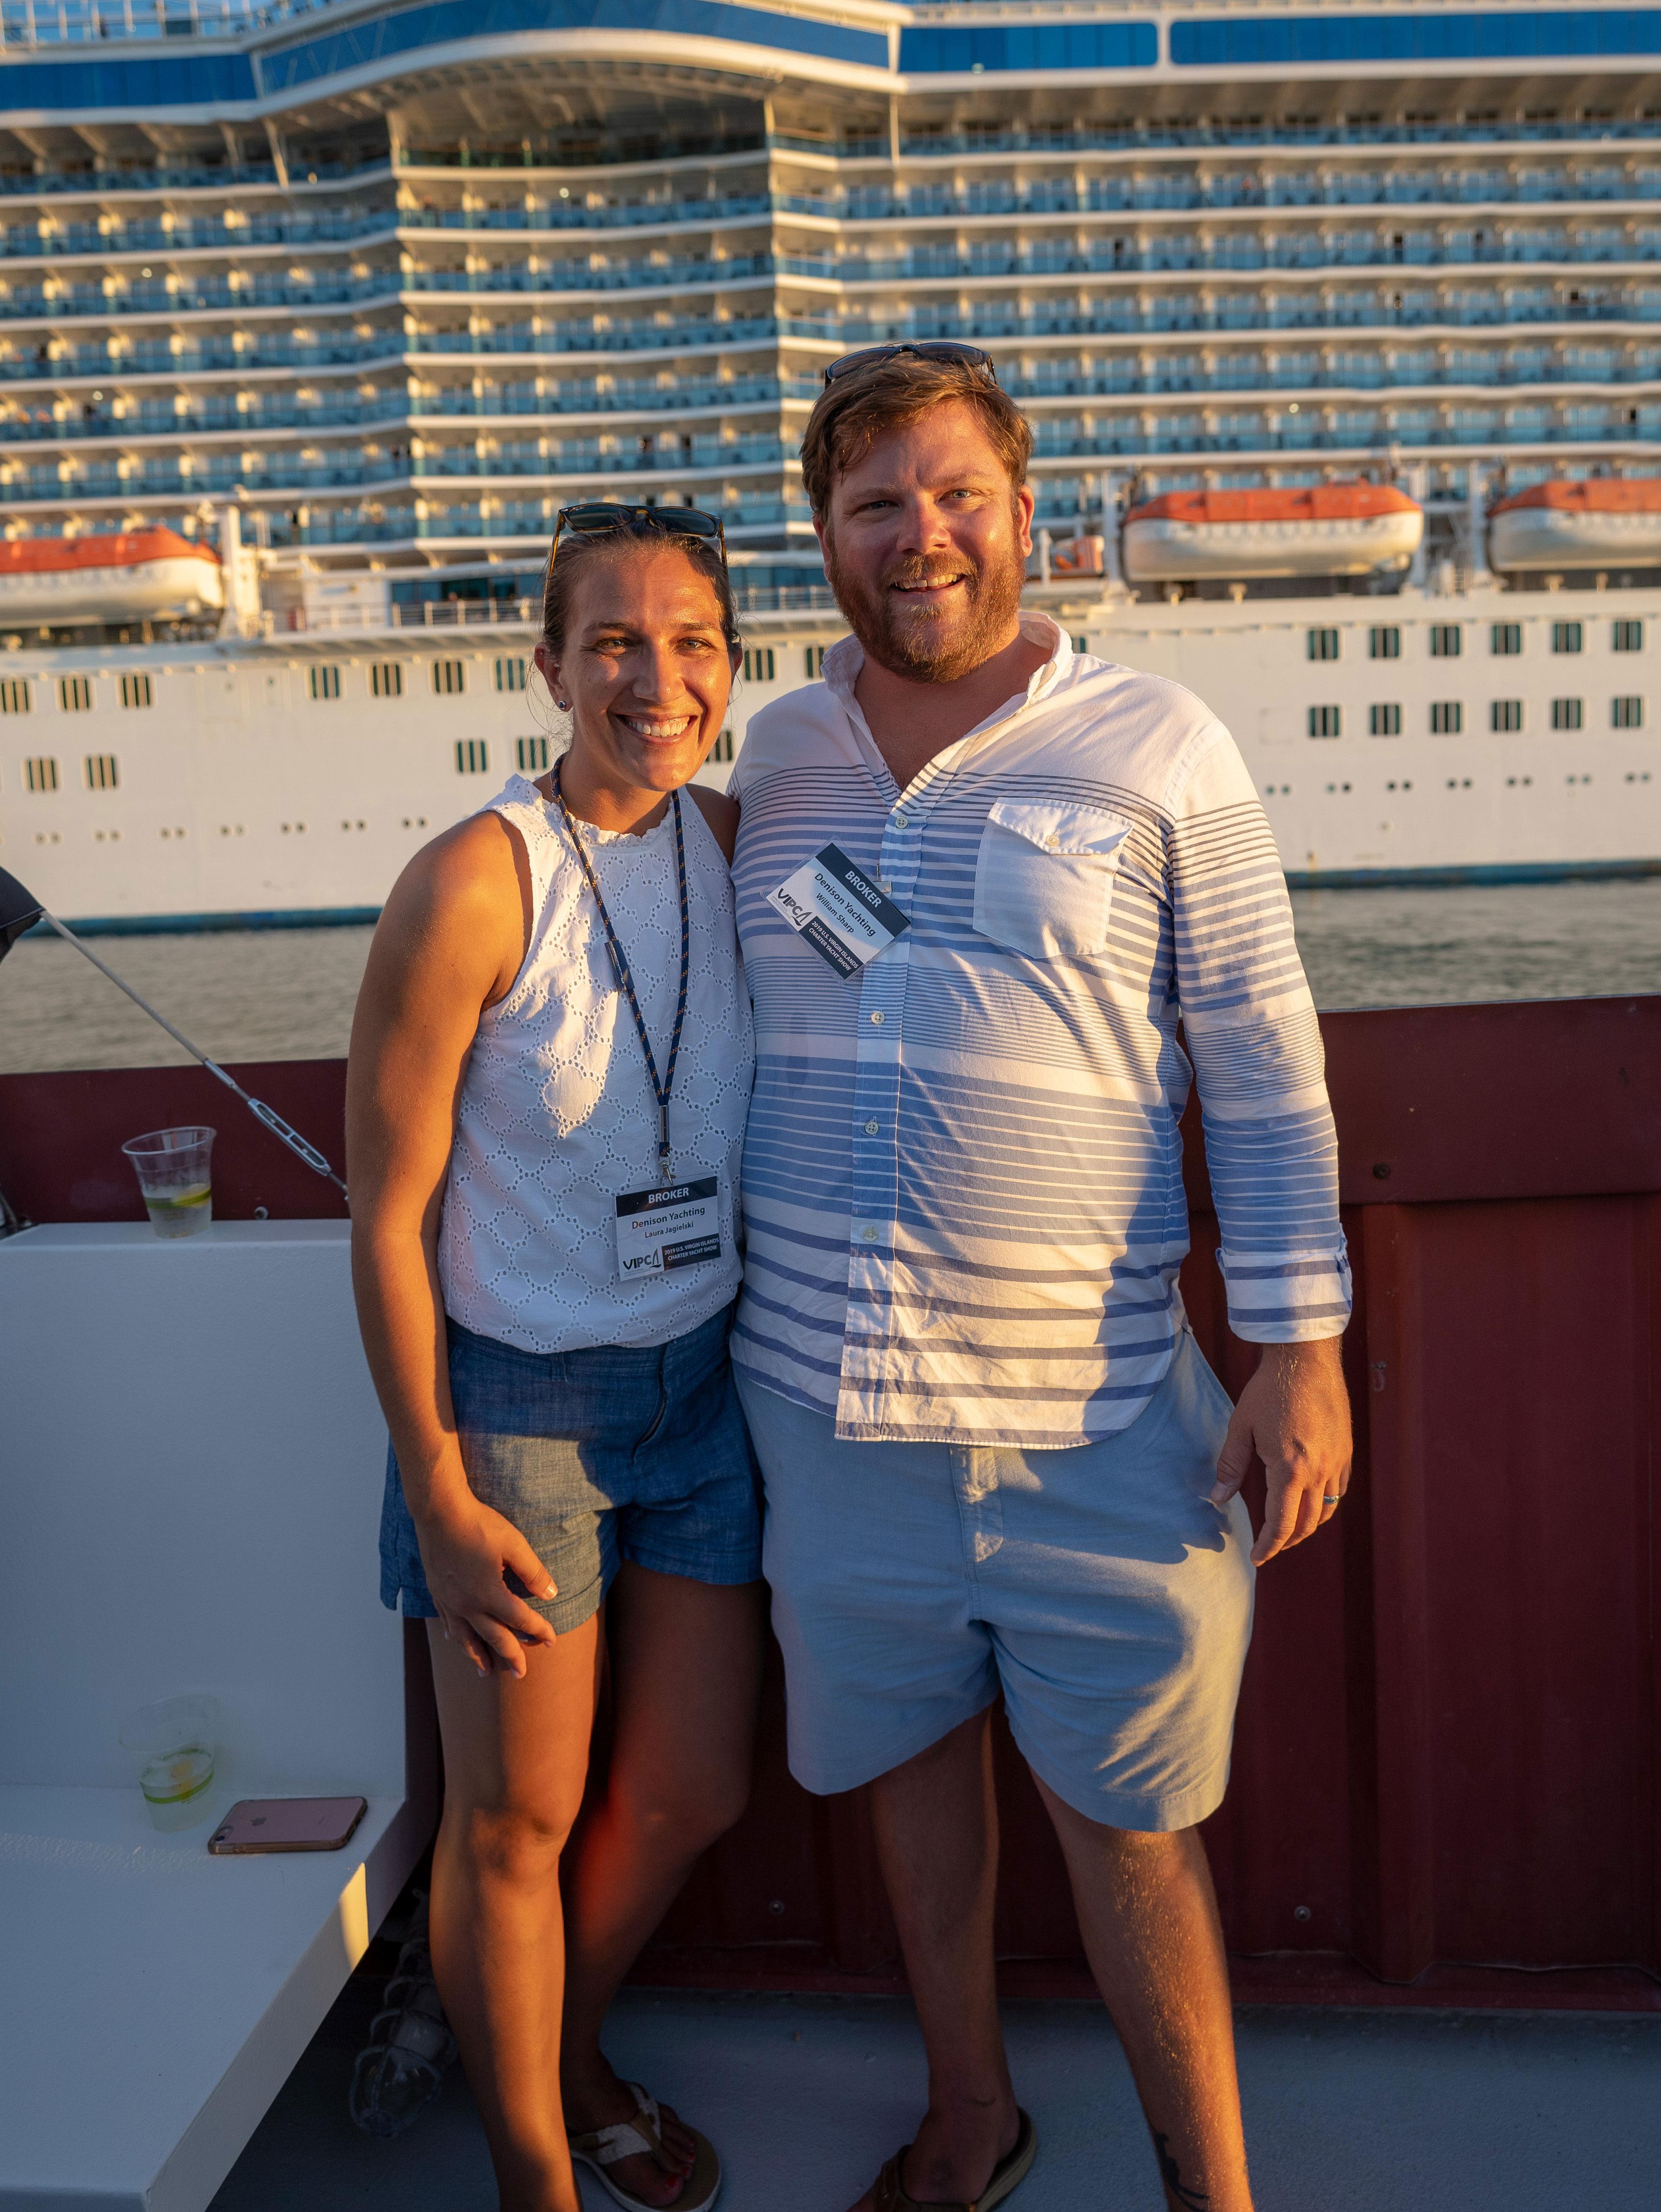 BVI and USVI Charter Yacht Shows 2019 Wiley Sharp Laura Jagielski